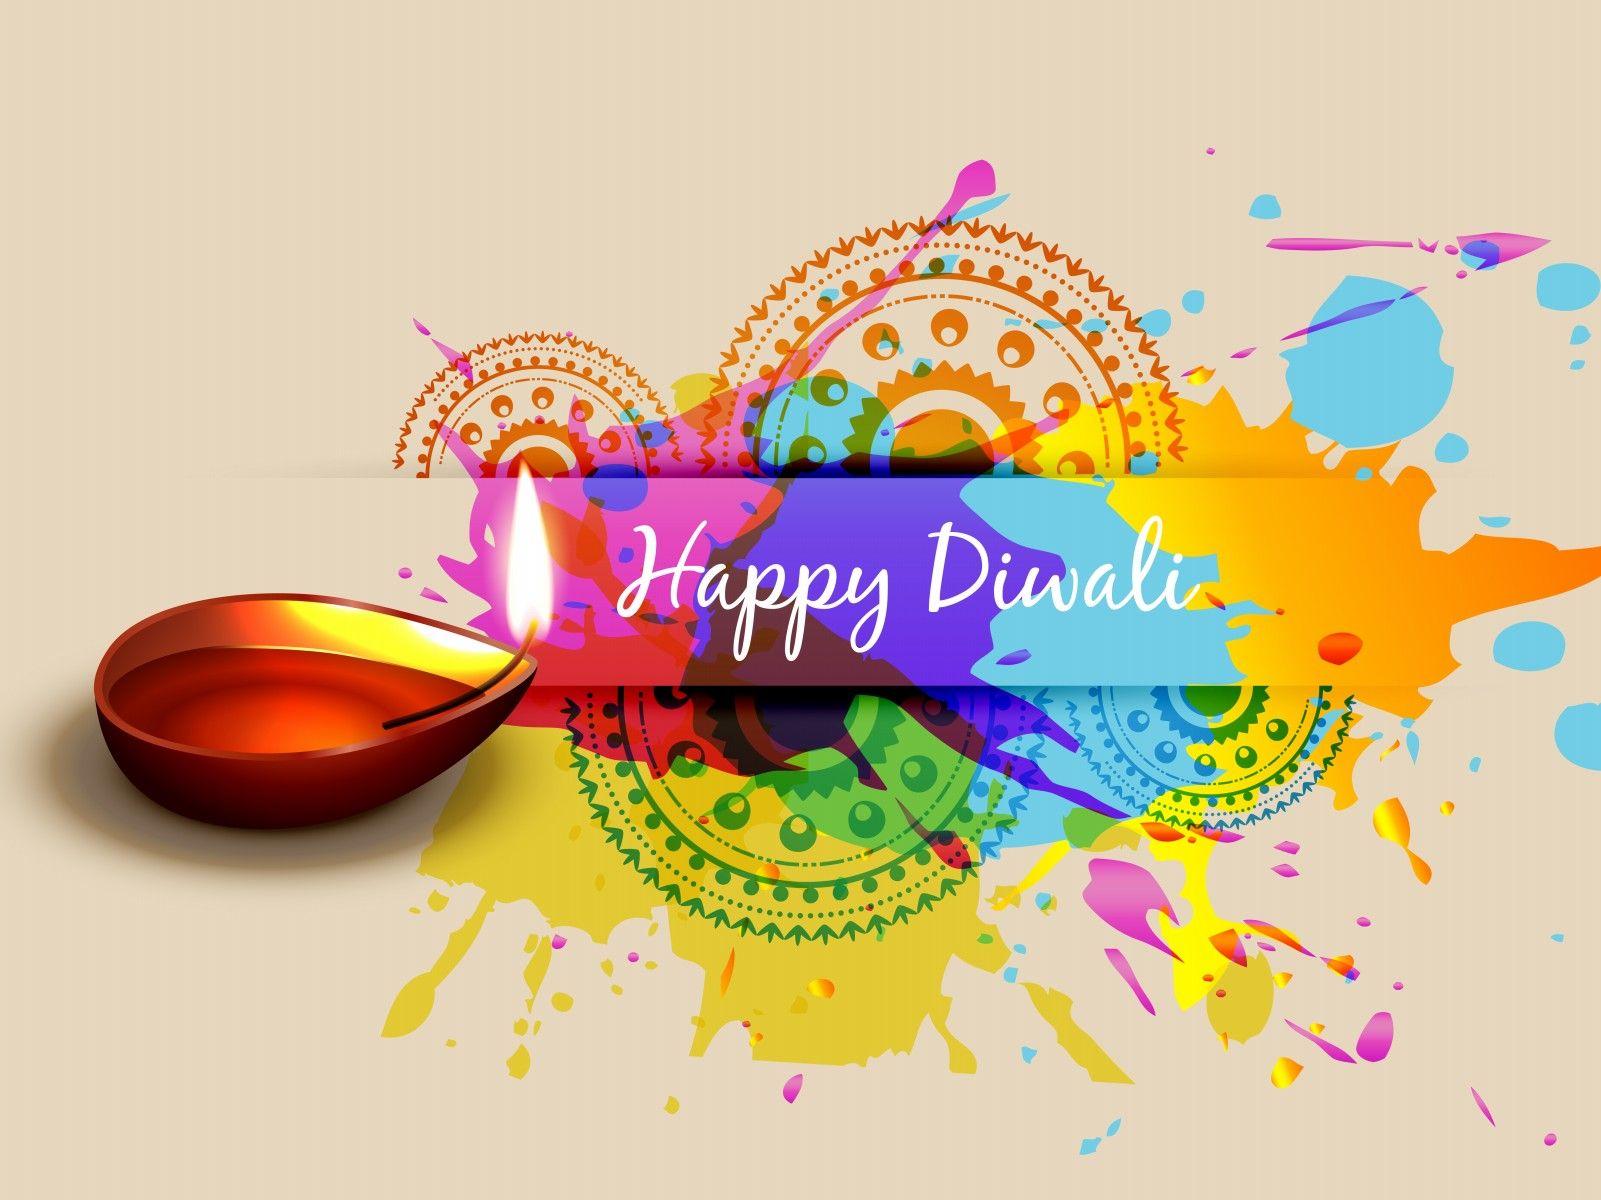 Happy Diwali Colorful Greetings Diwali Pinterest Happy Diwali